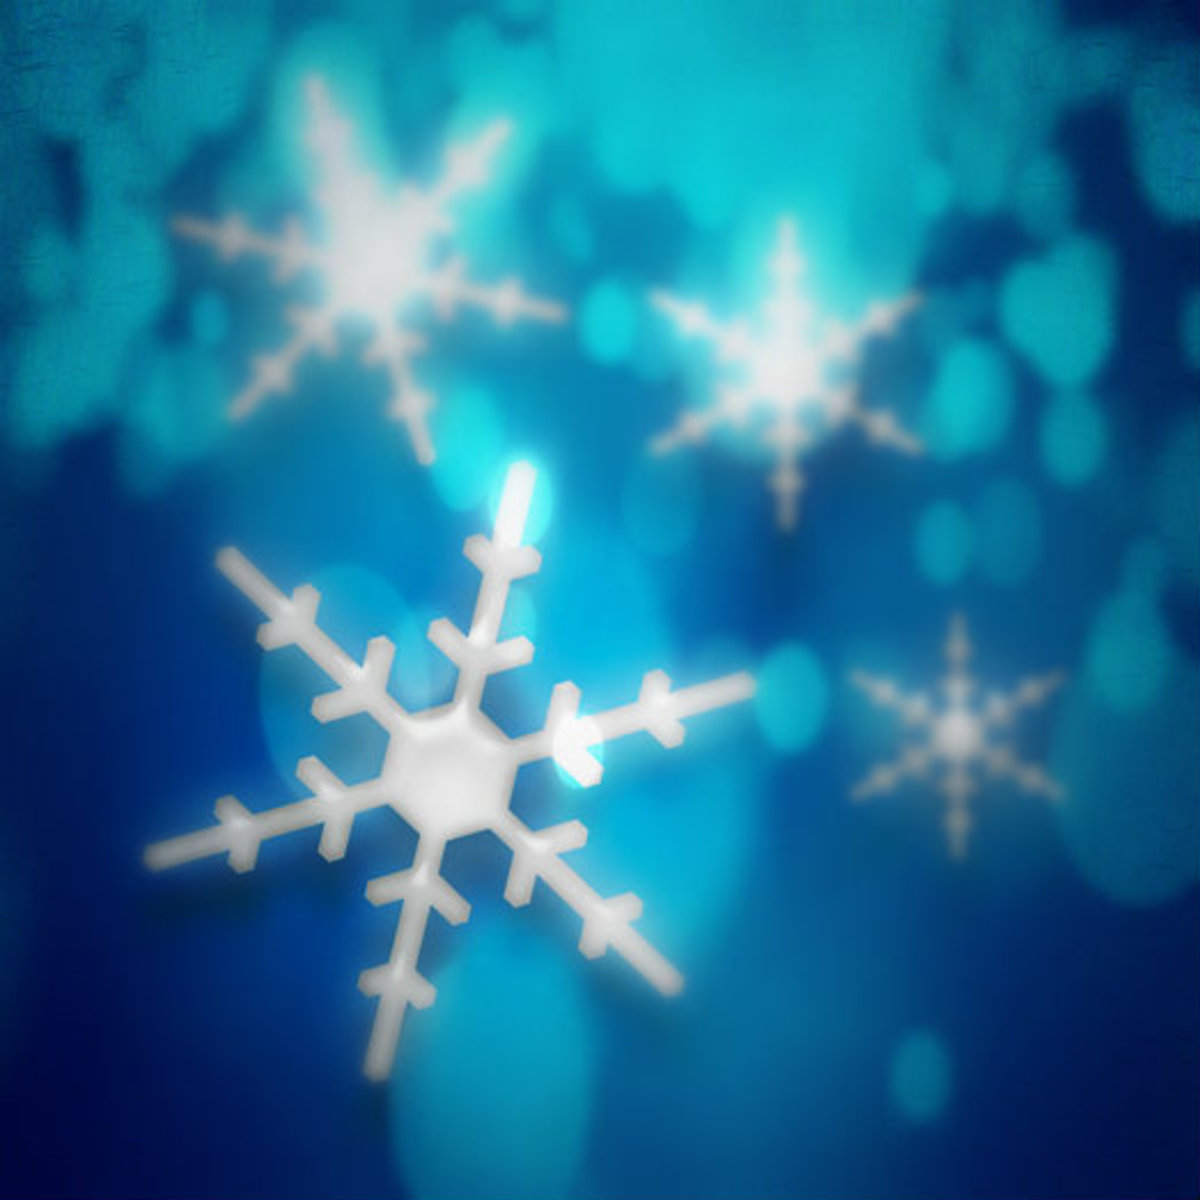 Winter Clip Art Snowflakes 4